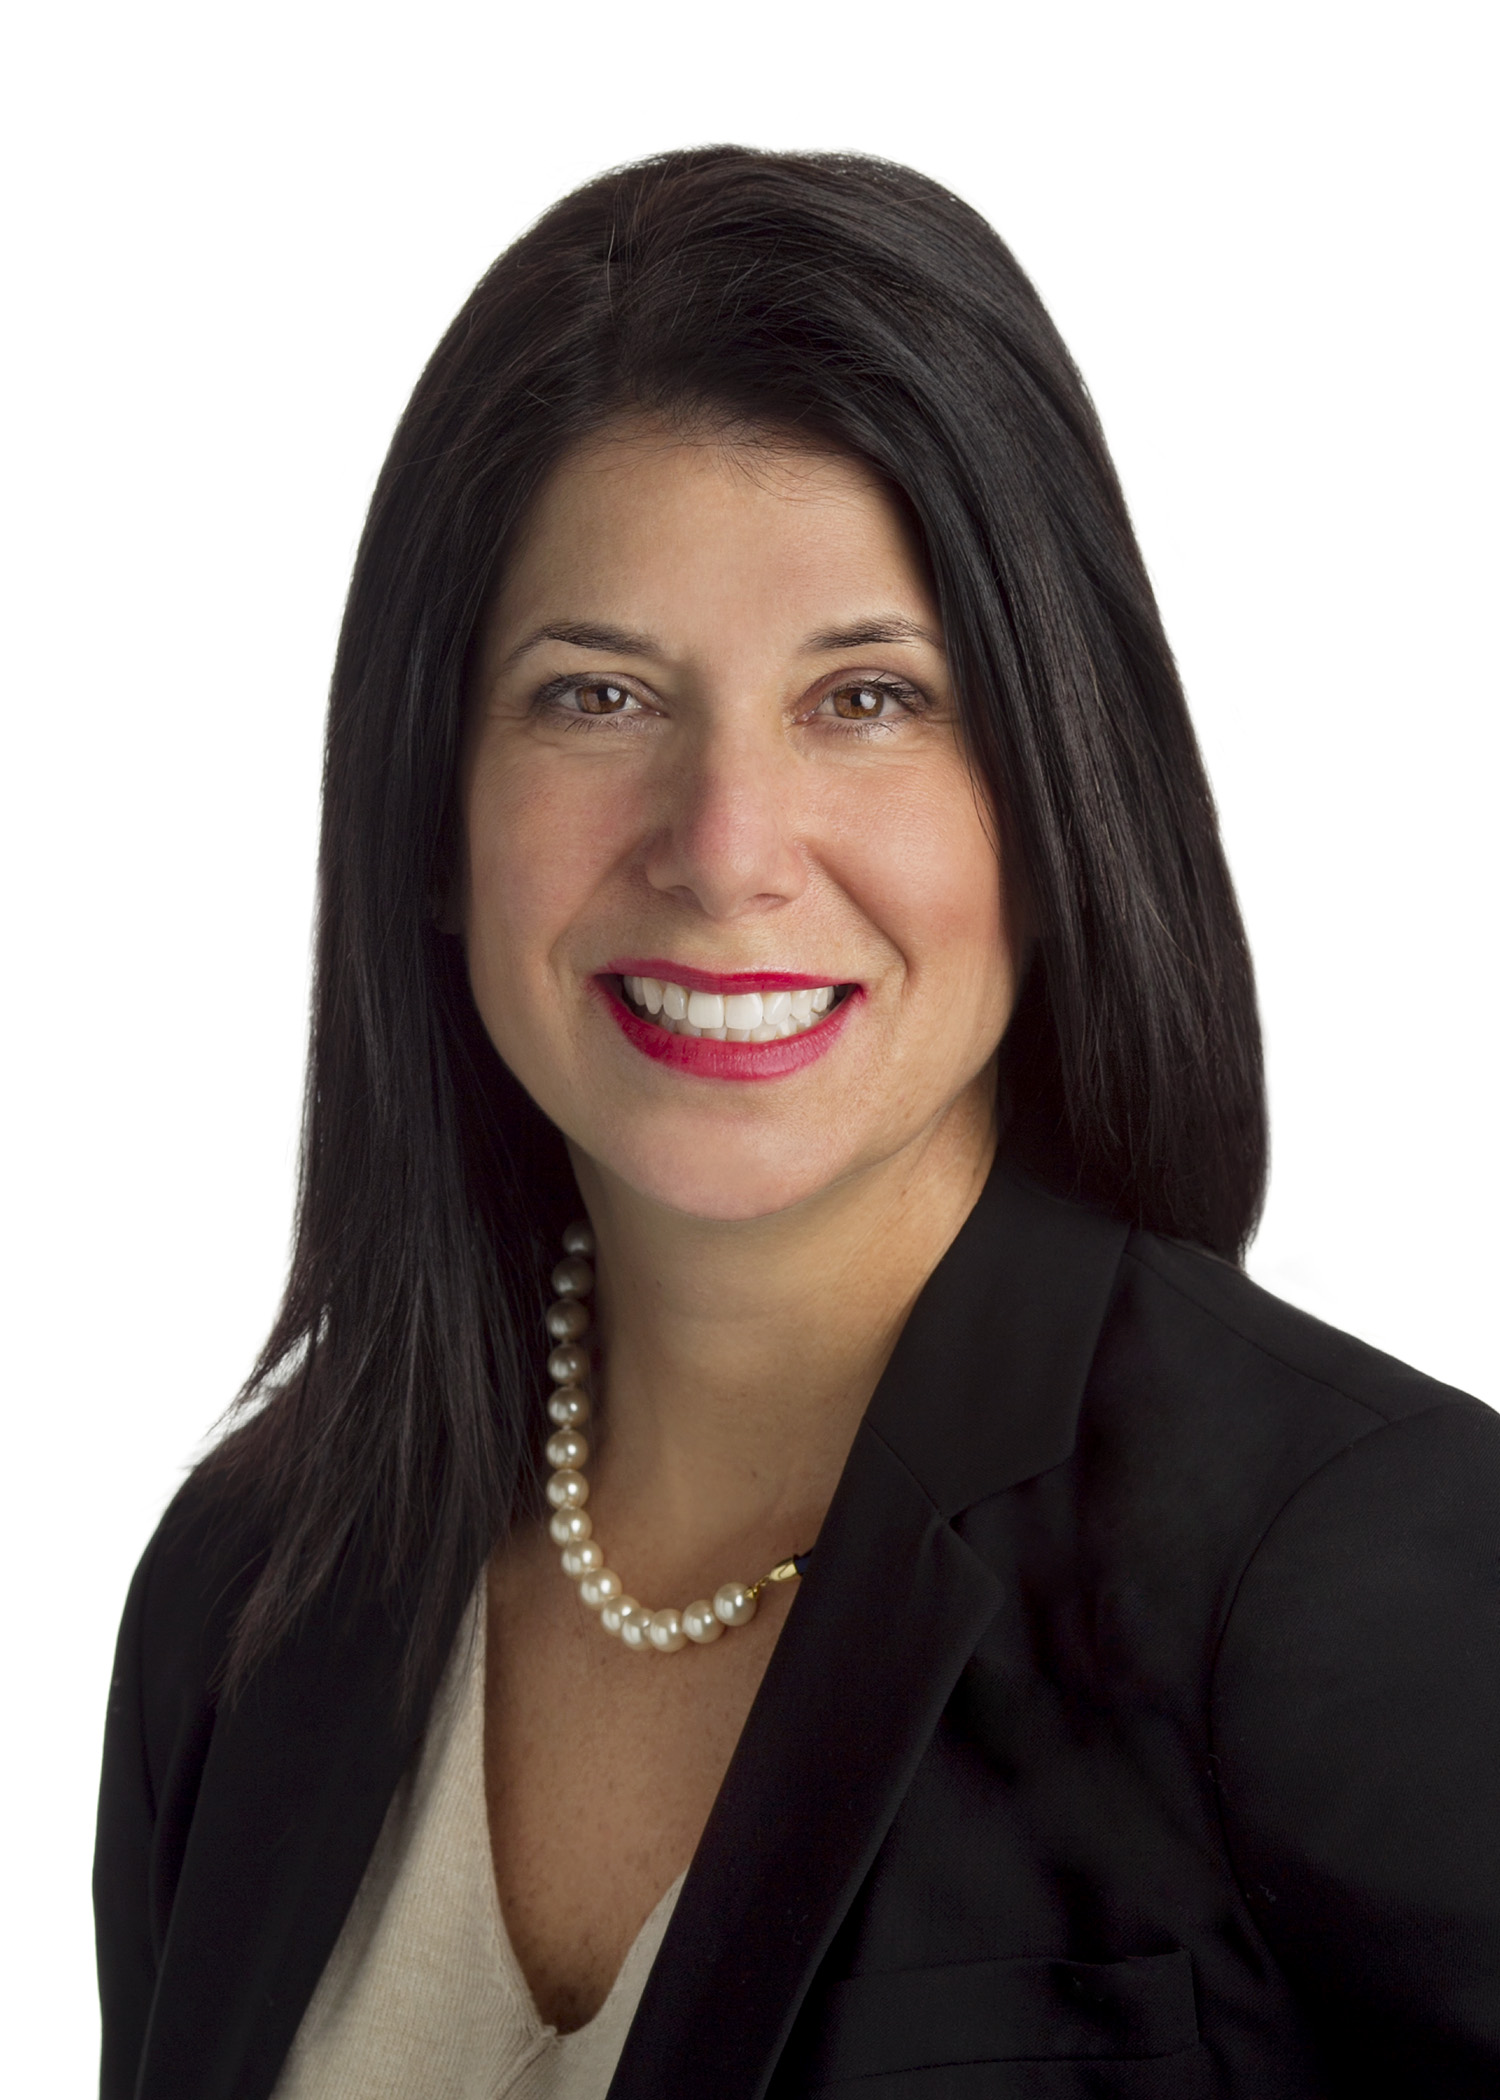 Kristin Francoeur